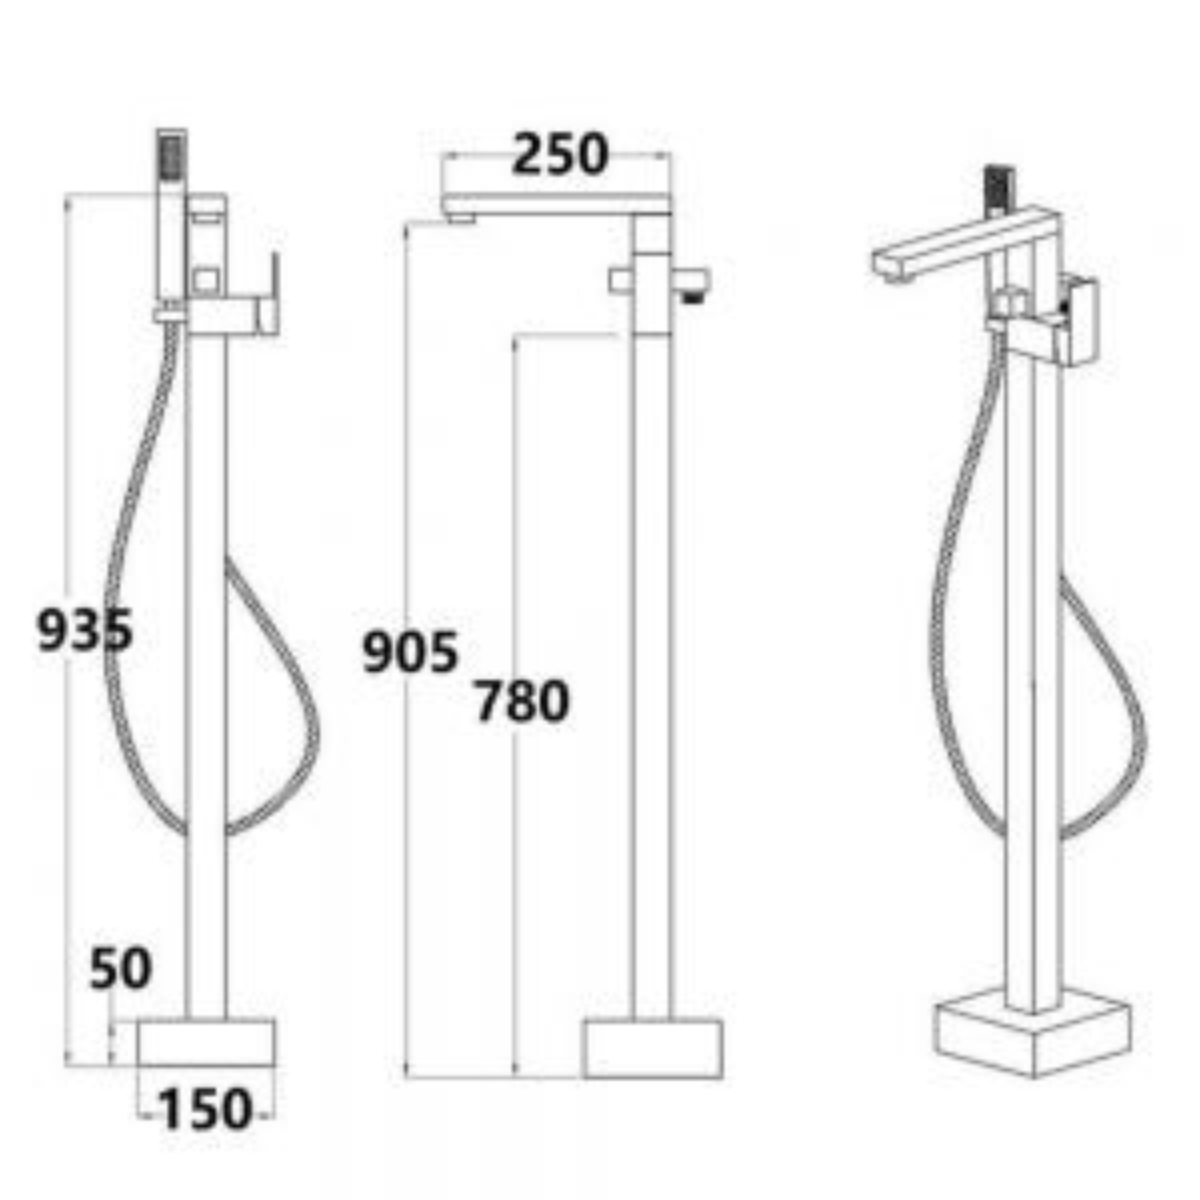 RAK Cubis Freestanding Shower Bath Mixer Tap Measurements